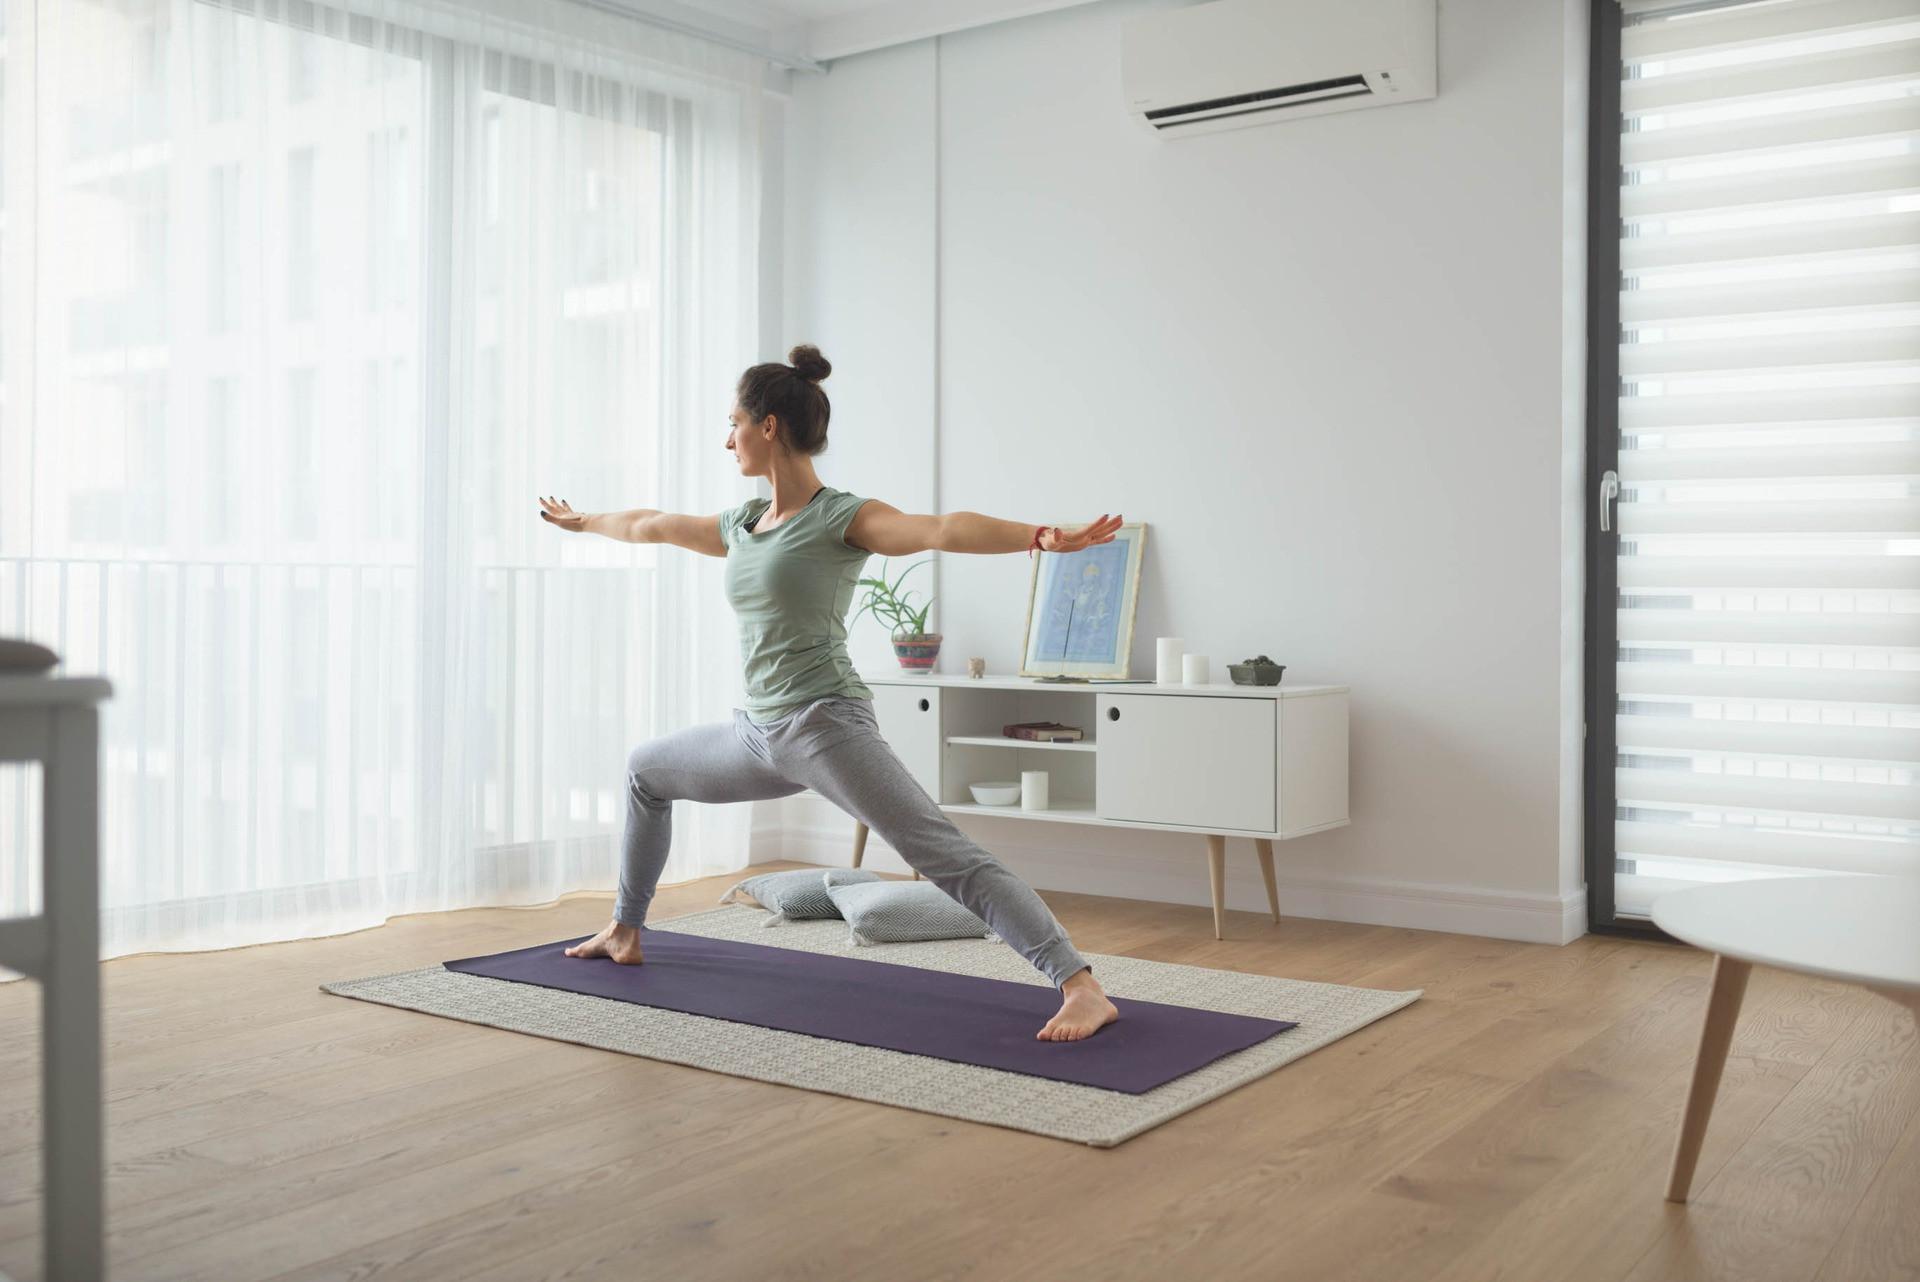 Online Hatha Yoga with Oana